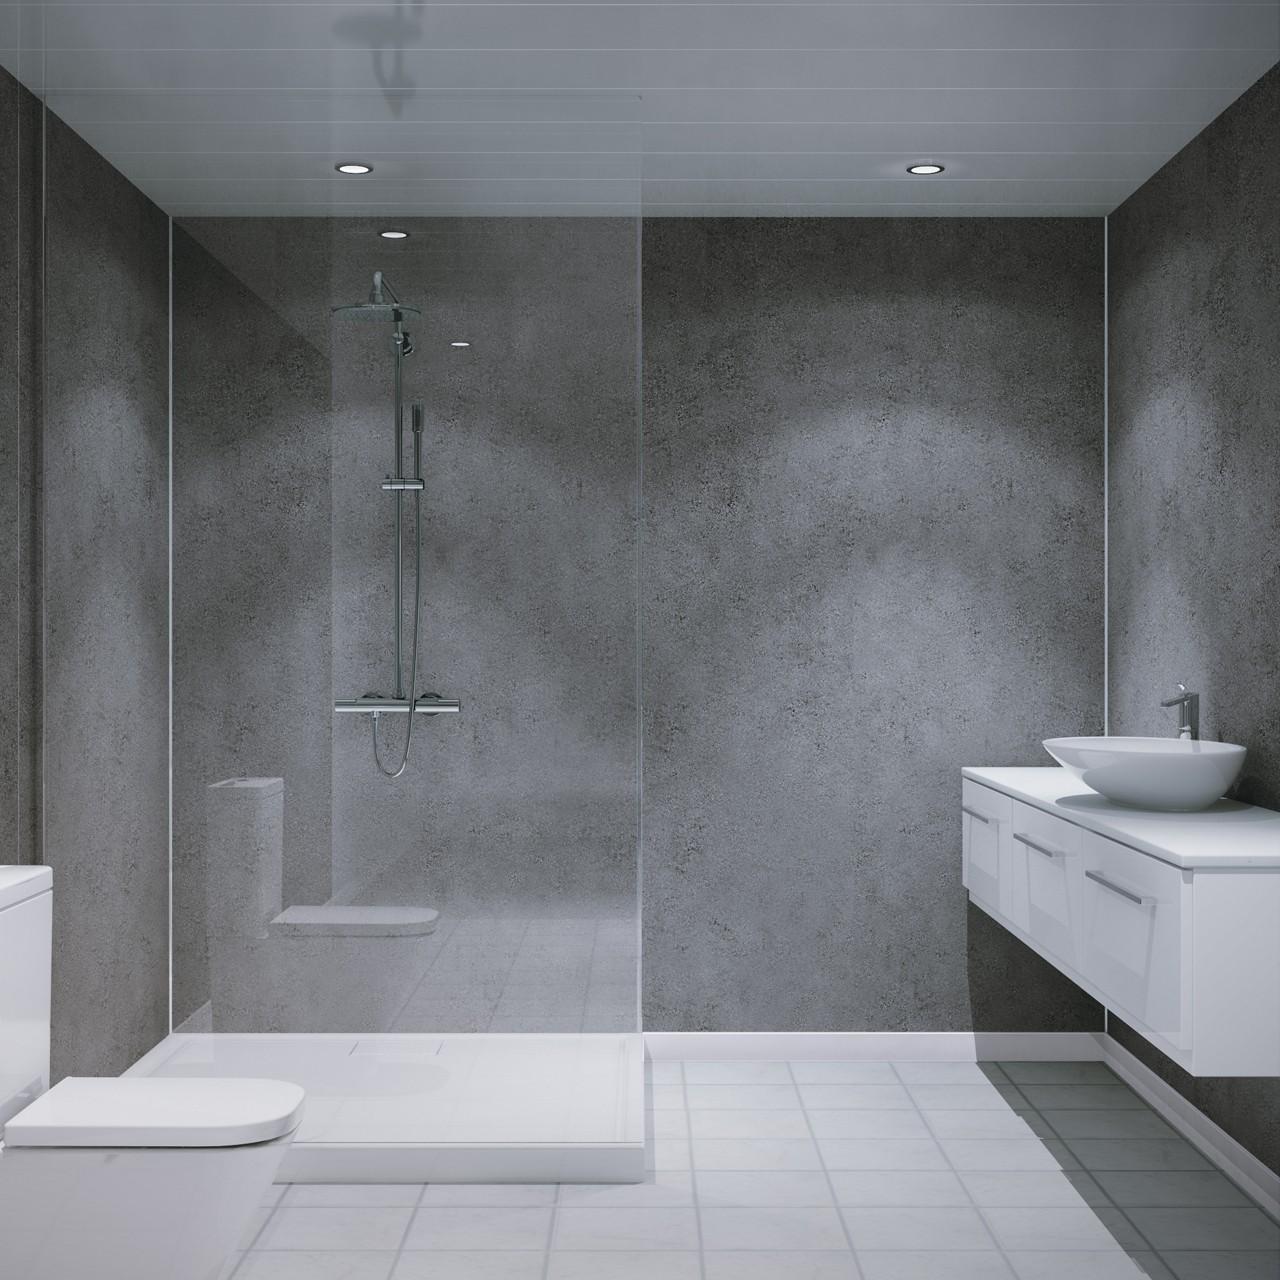 Ремонт туалета панелями темными